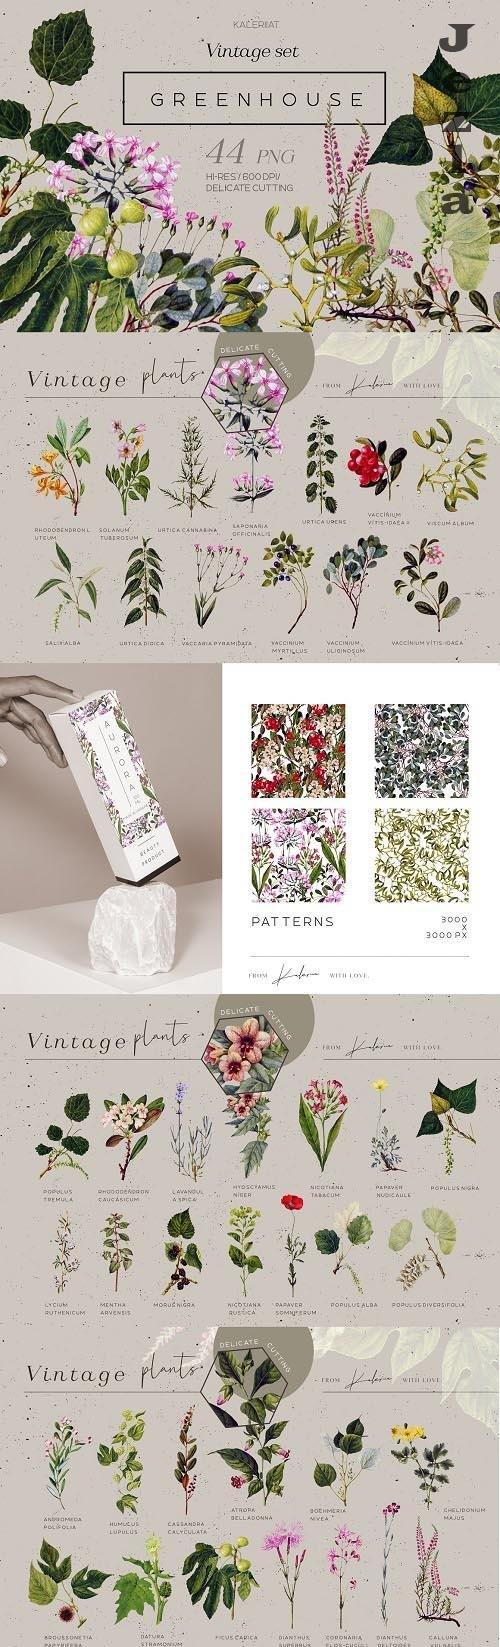 Greenhouse - Vintage Botanical Set - 5264466